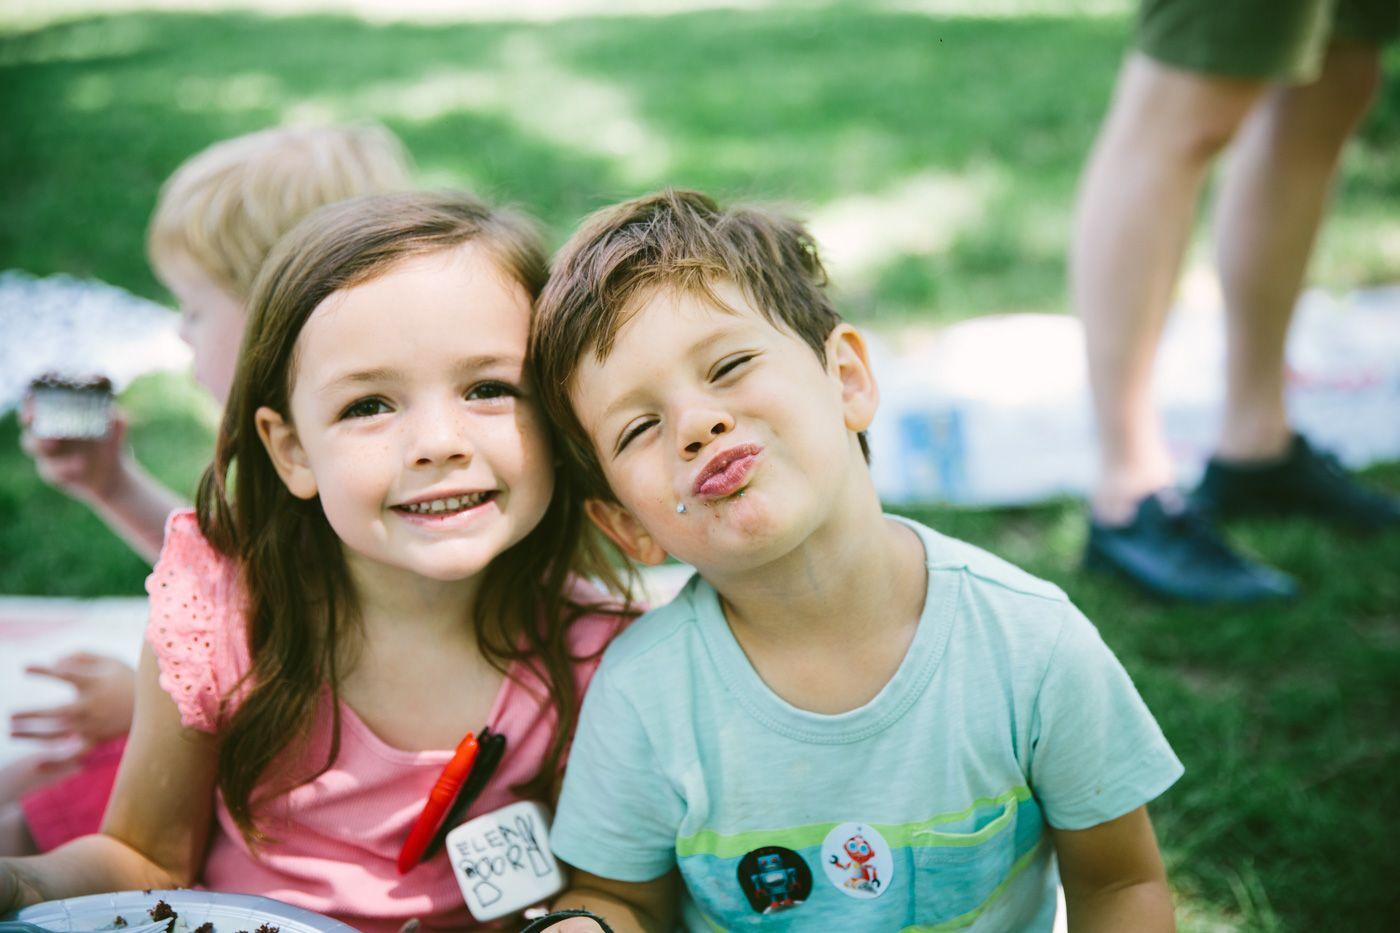 LOVE TAZA SAMSON'S 4TH BIRTHDAY